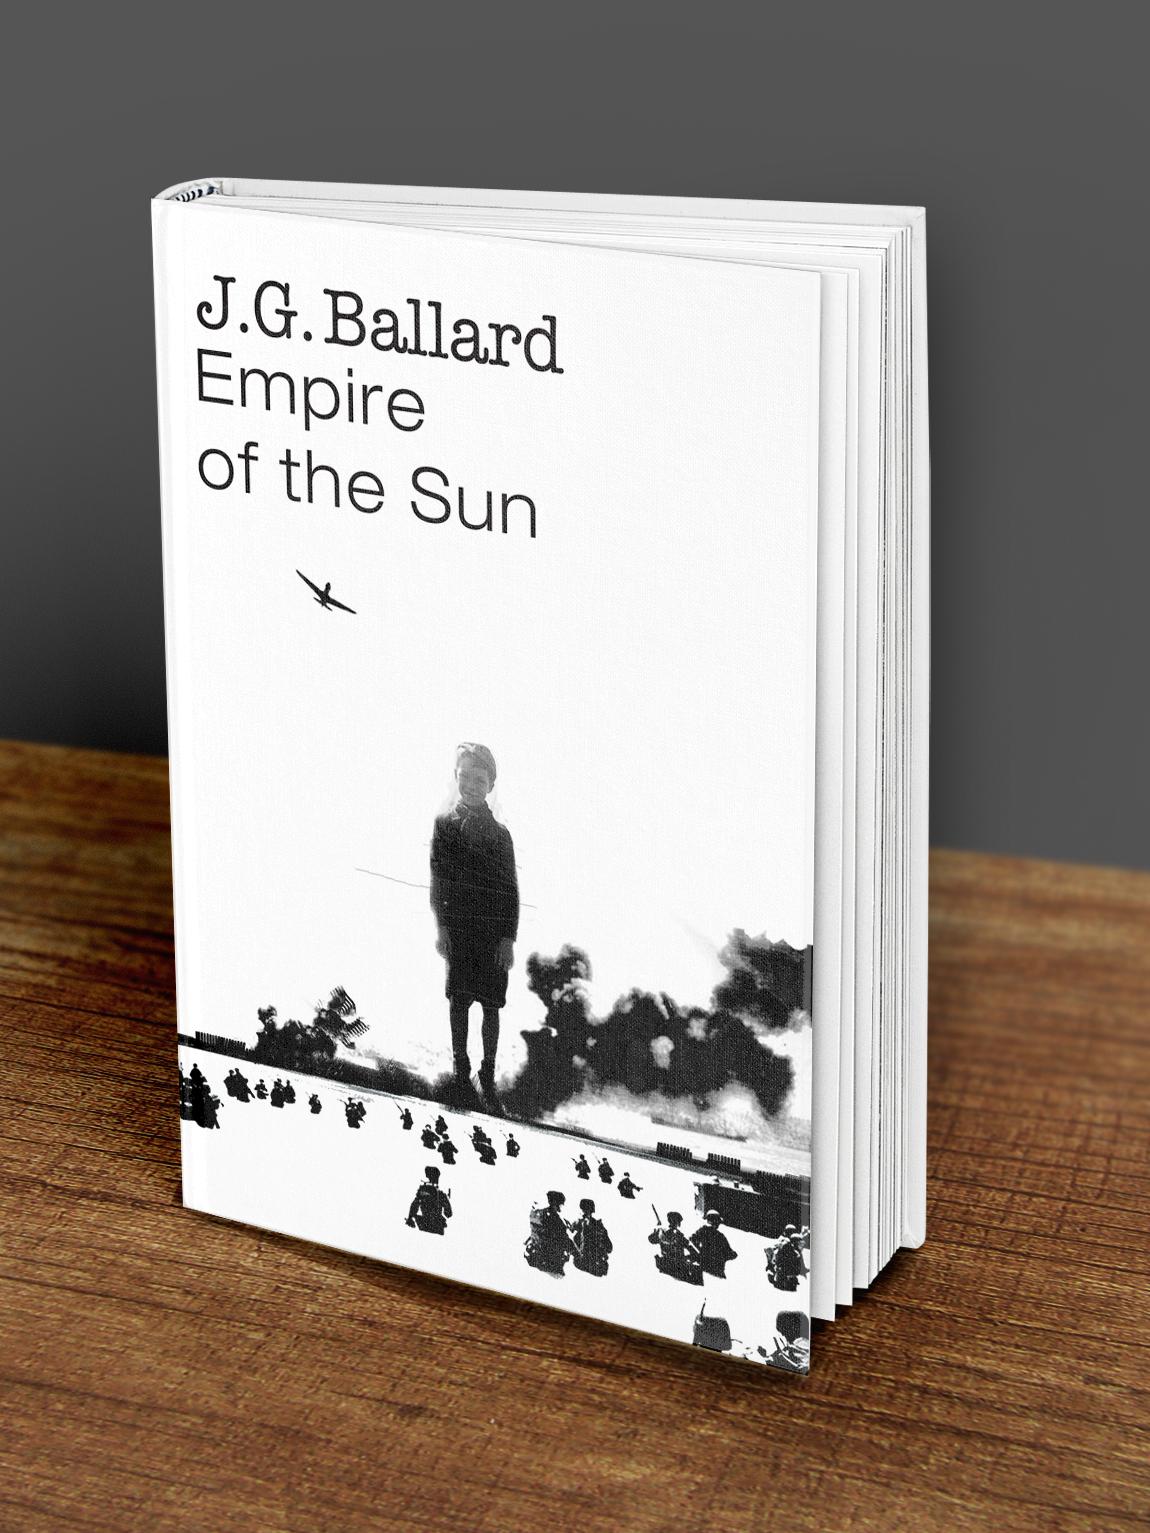 ballard 2.jpg